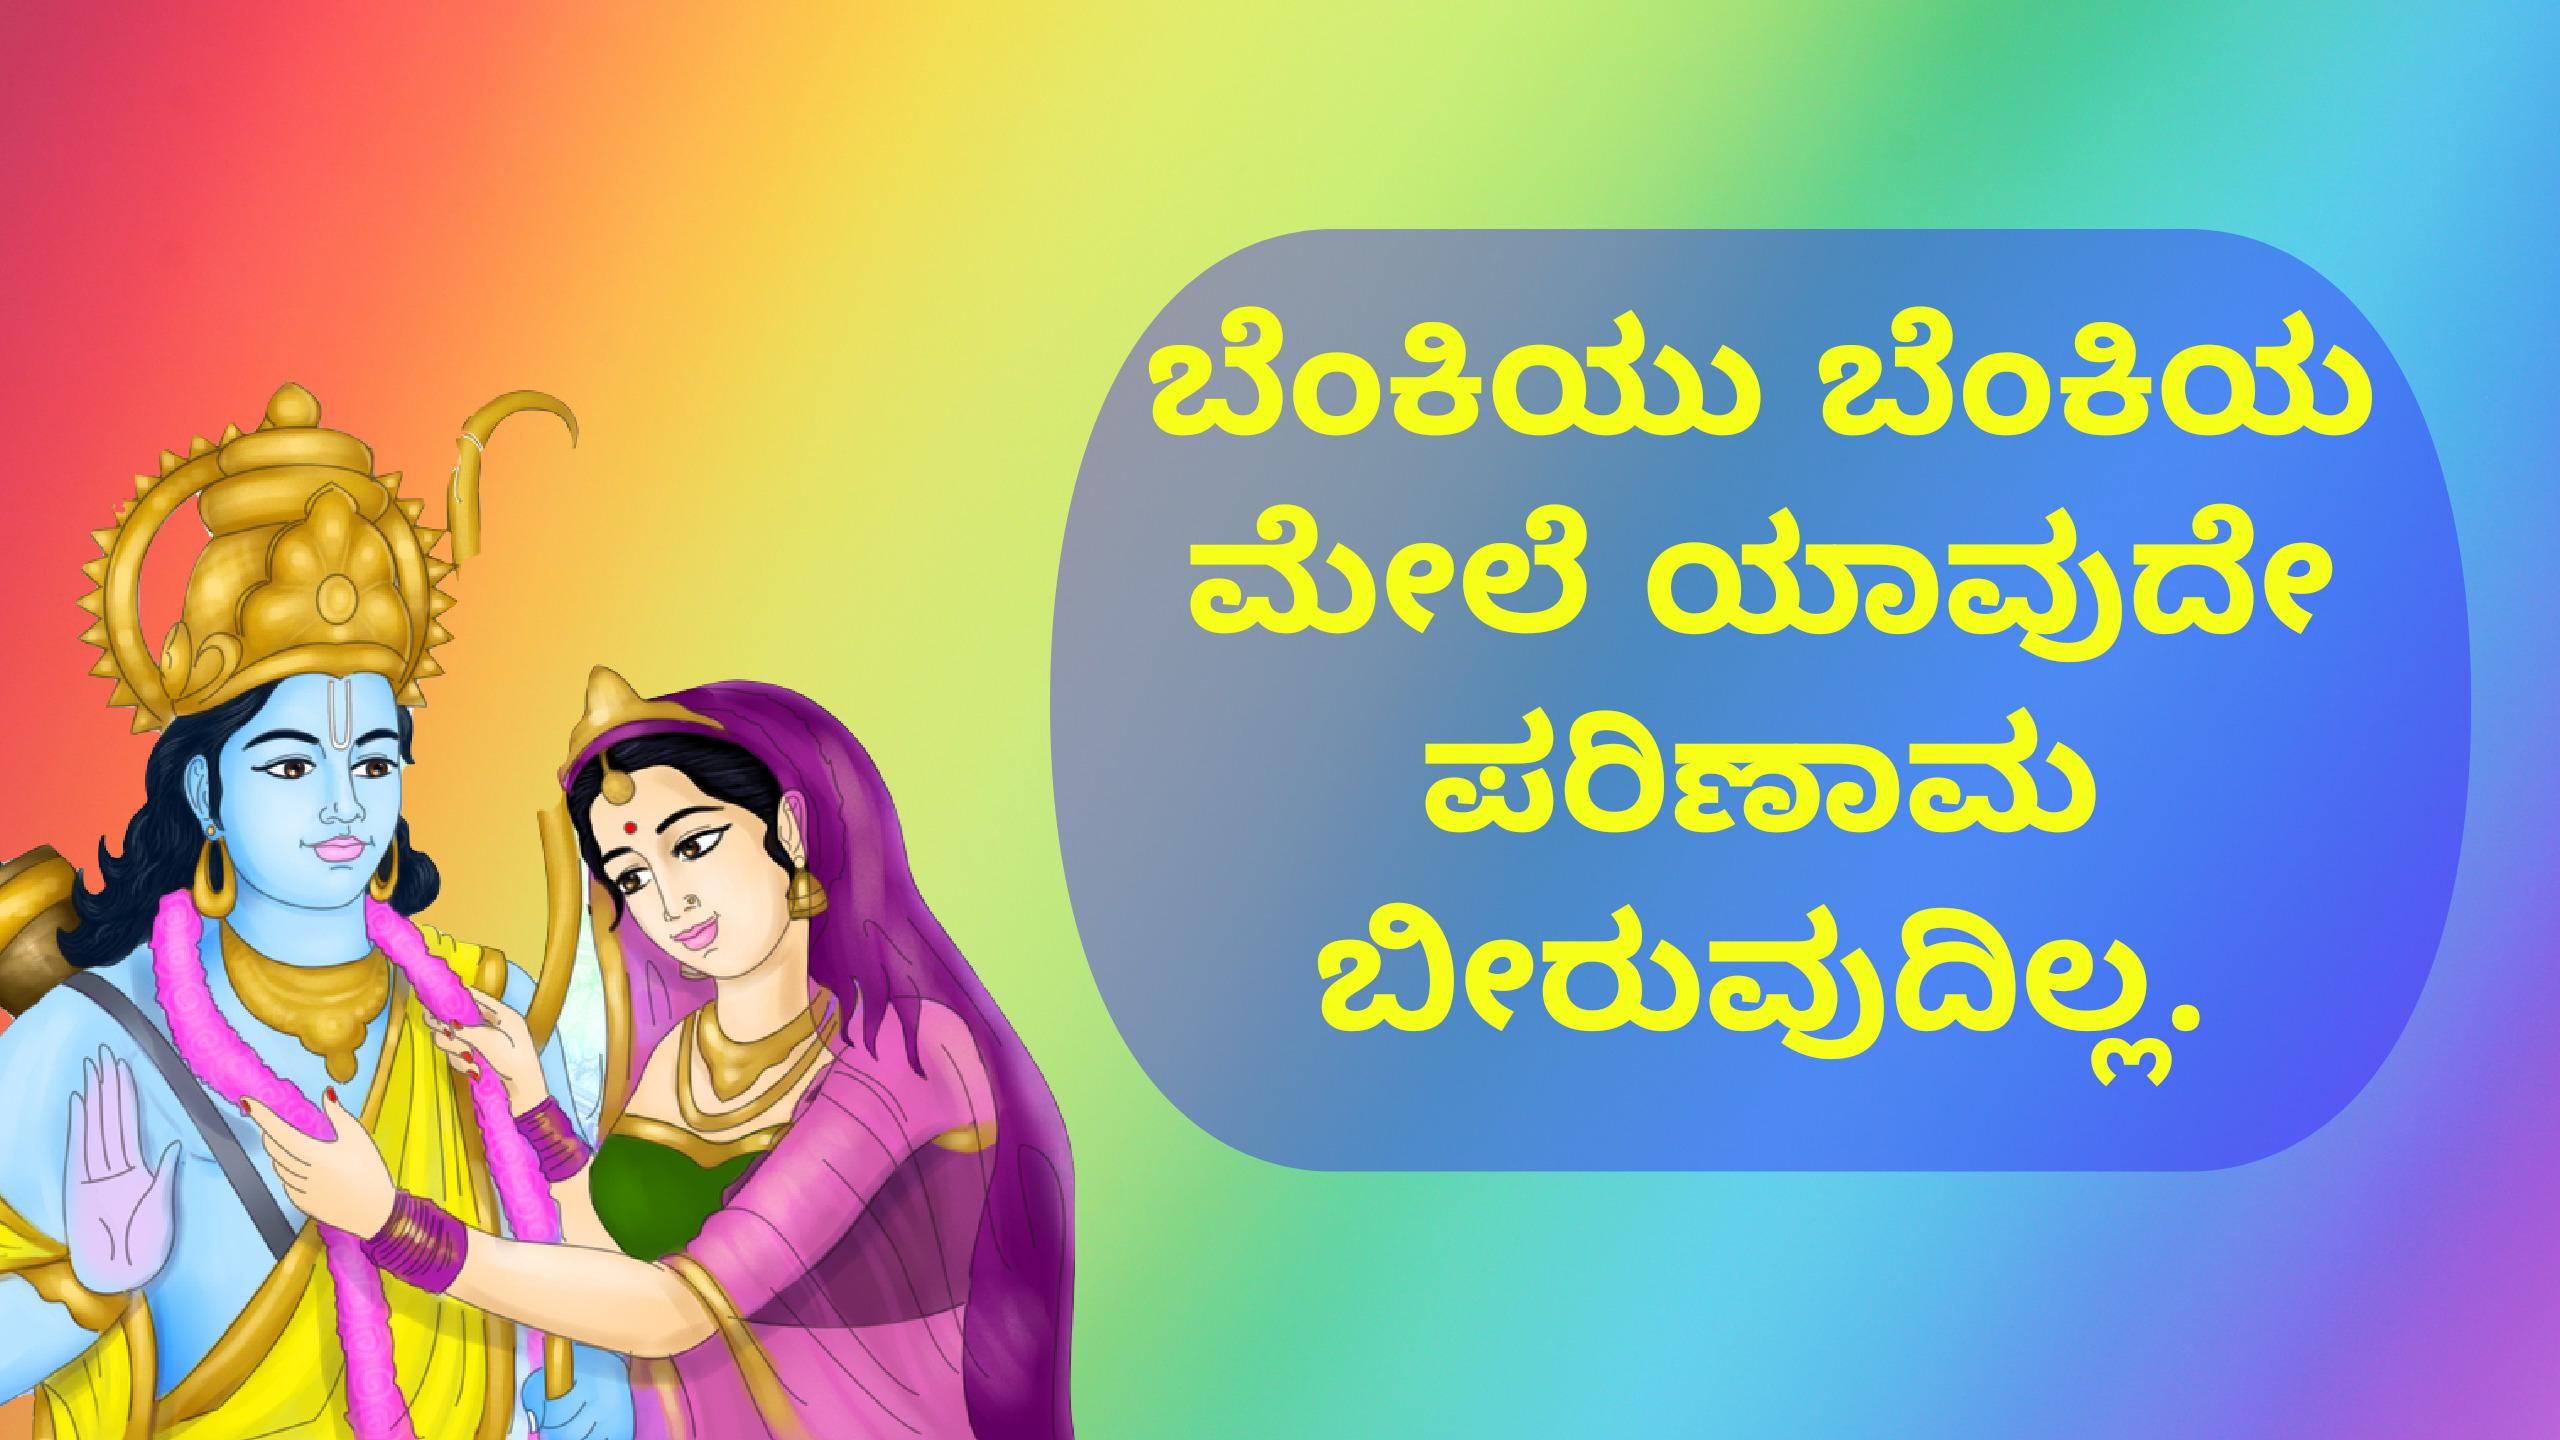 5. Shree Ram Quotes in Kannada